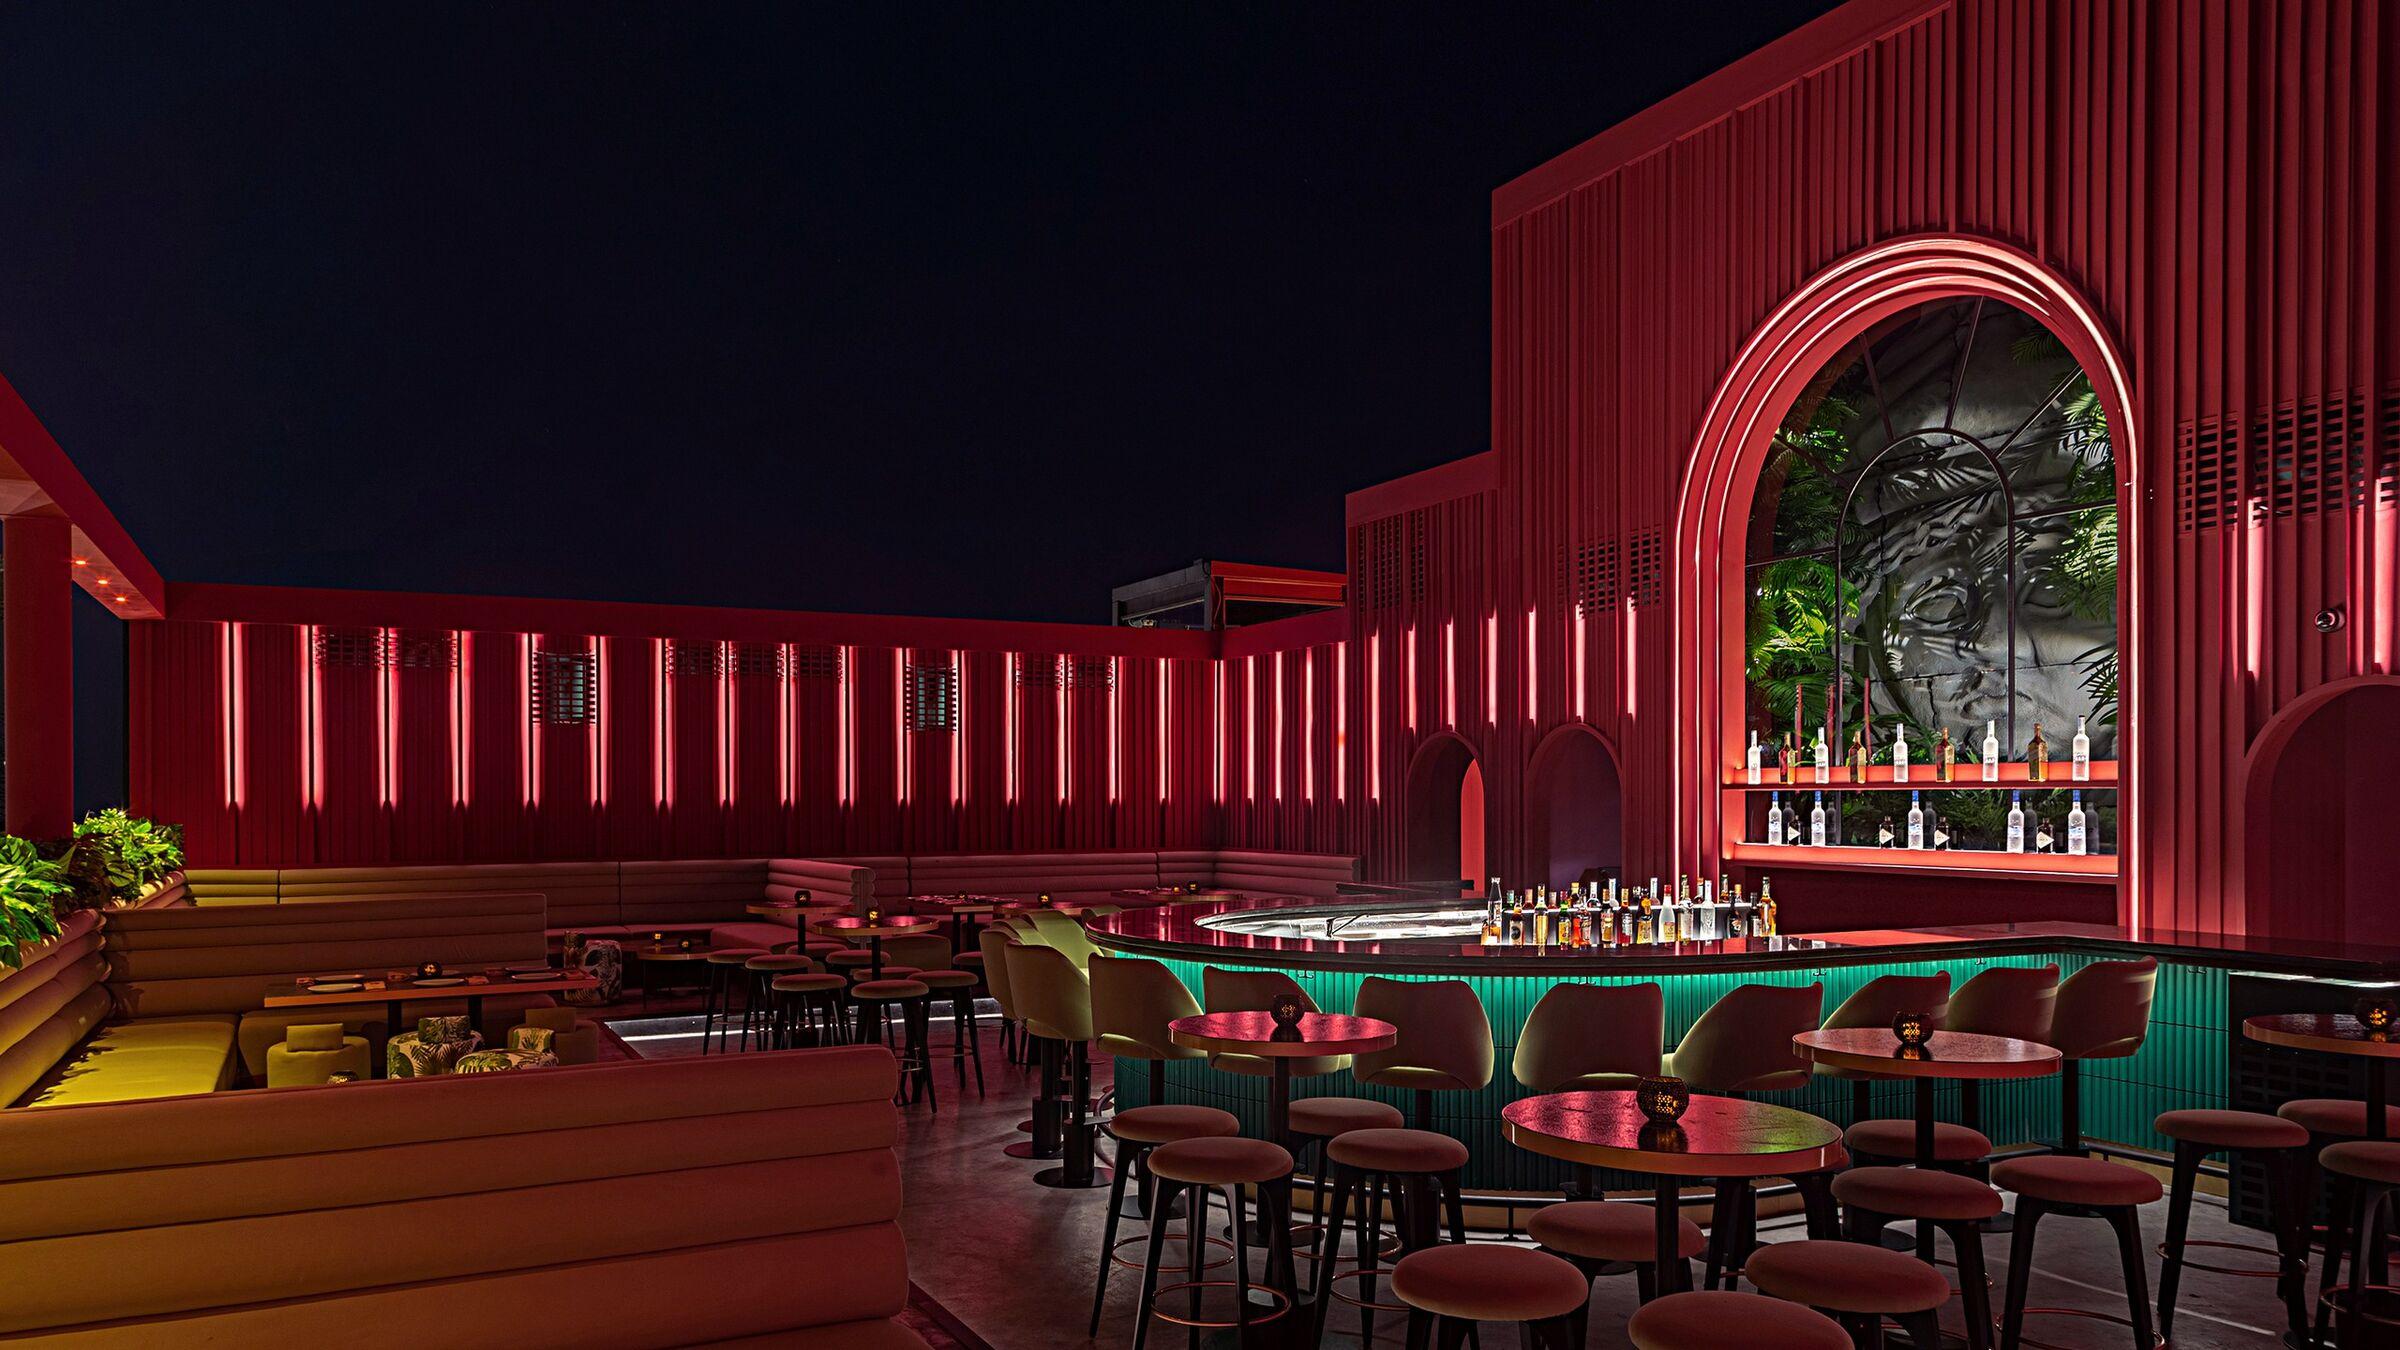 Bau Rooftop Lounge Bar Rabih Geha Architects Rg Architects Archello